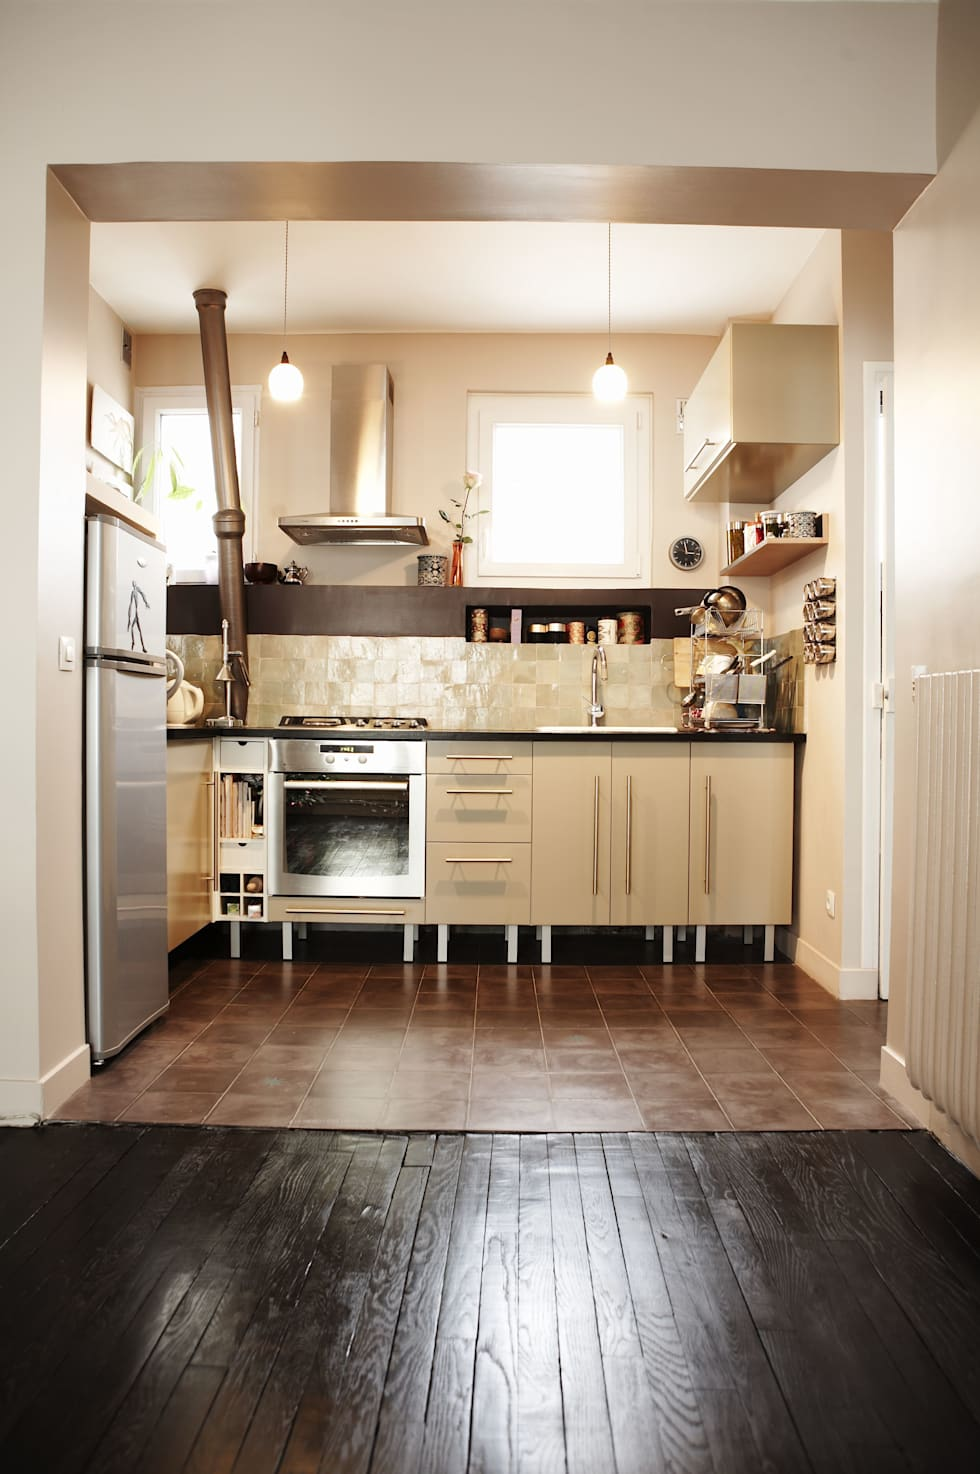 zellige cuisine amazing information with zellige cuisine simple des zelliges verts dans une. Black Bedroom Furniture Sets. Home Design Ideas